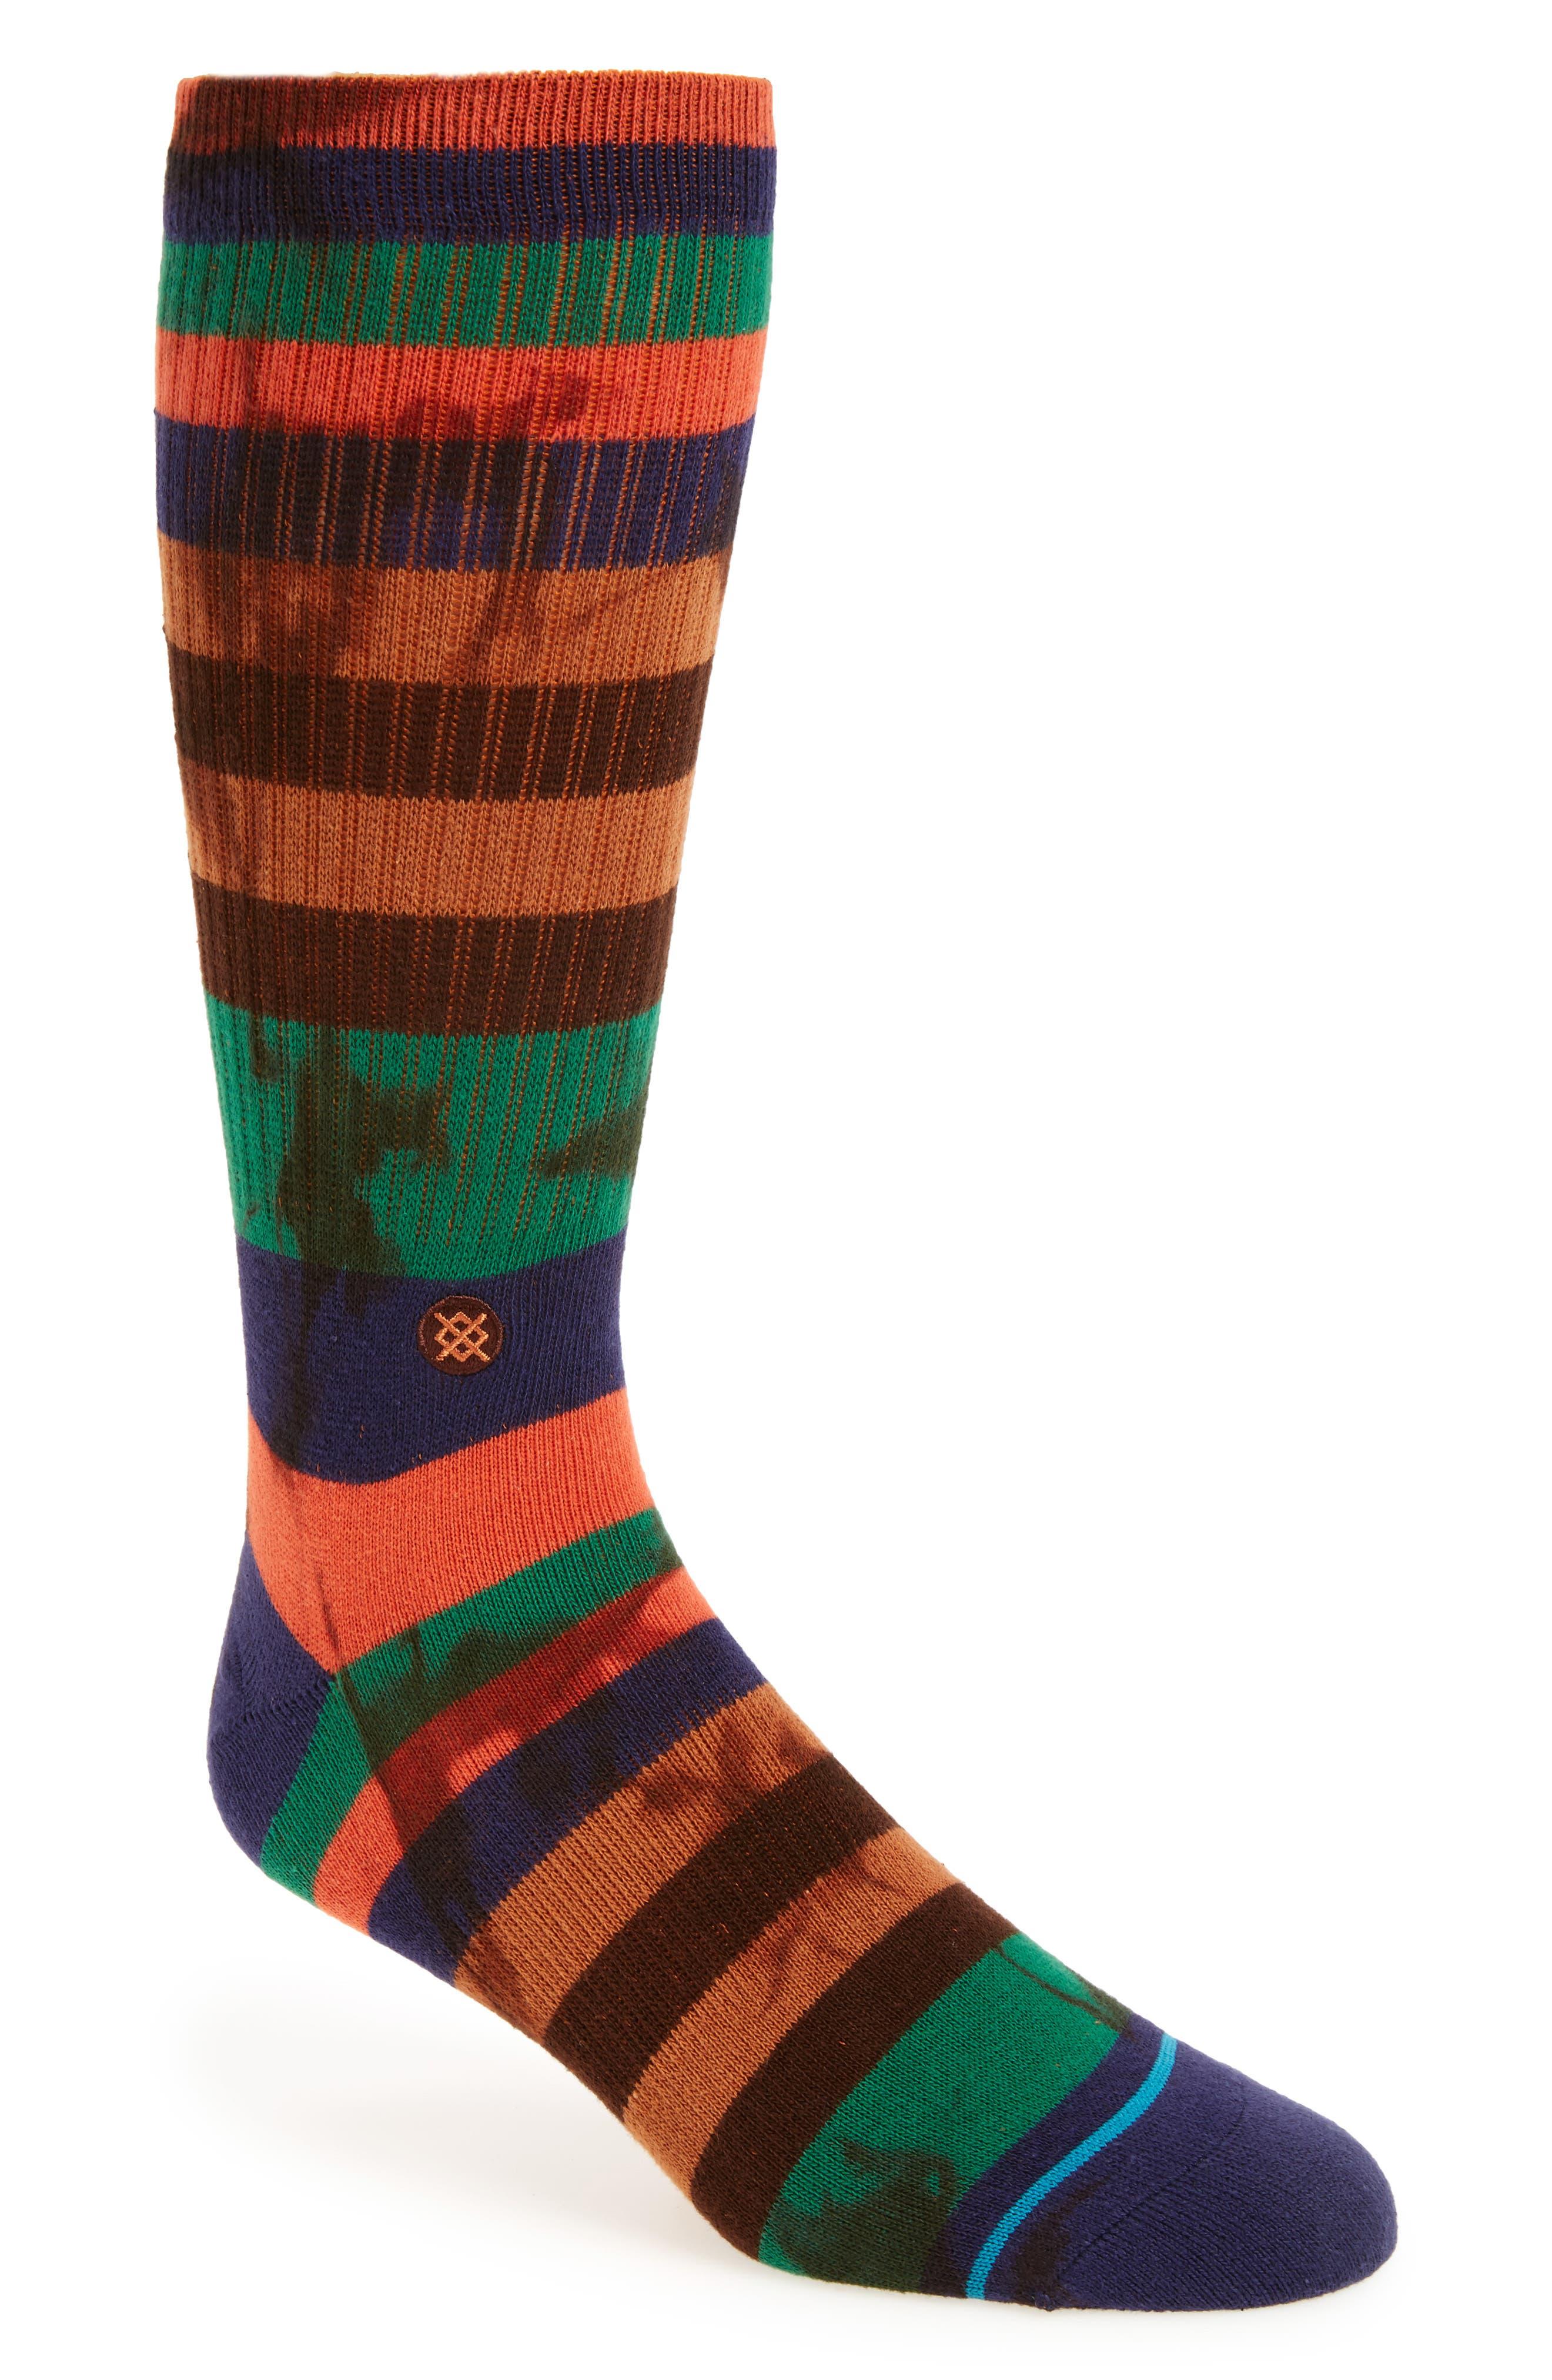 Otay 2 Crew Socks,                             Main thumbnail 1, color,                             400